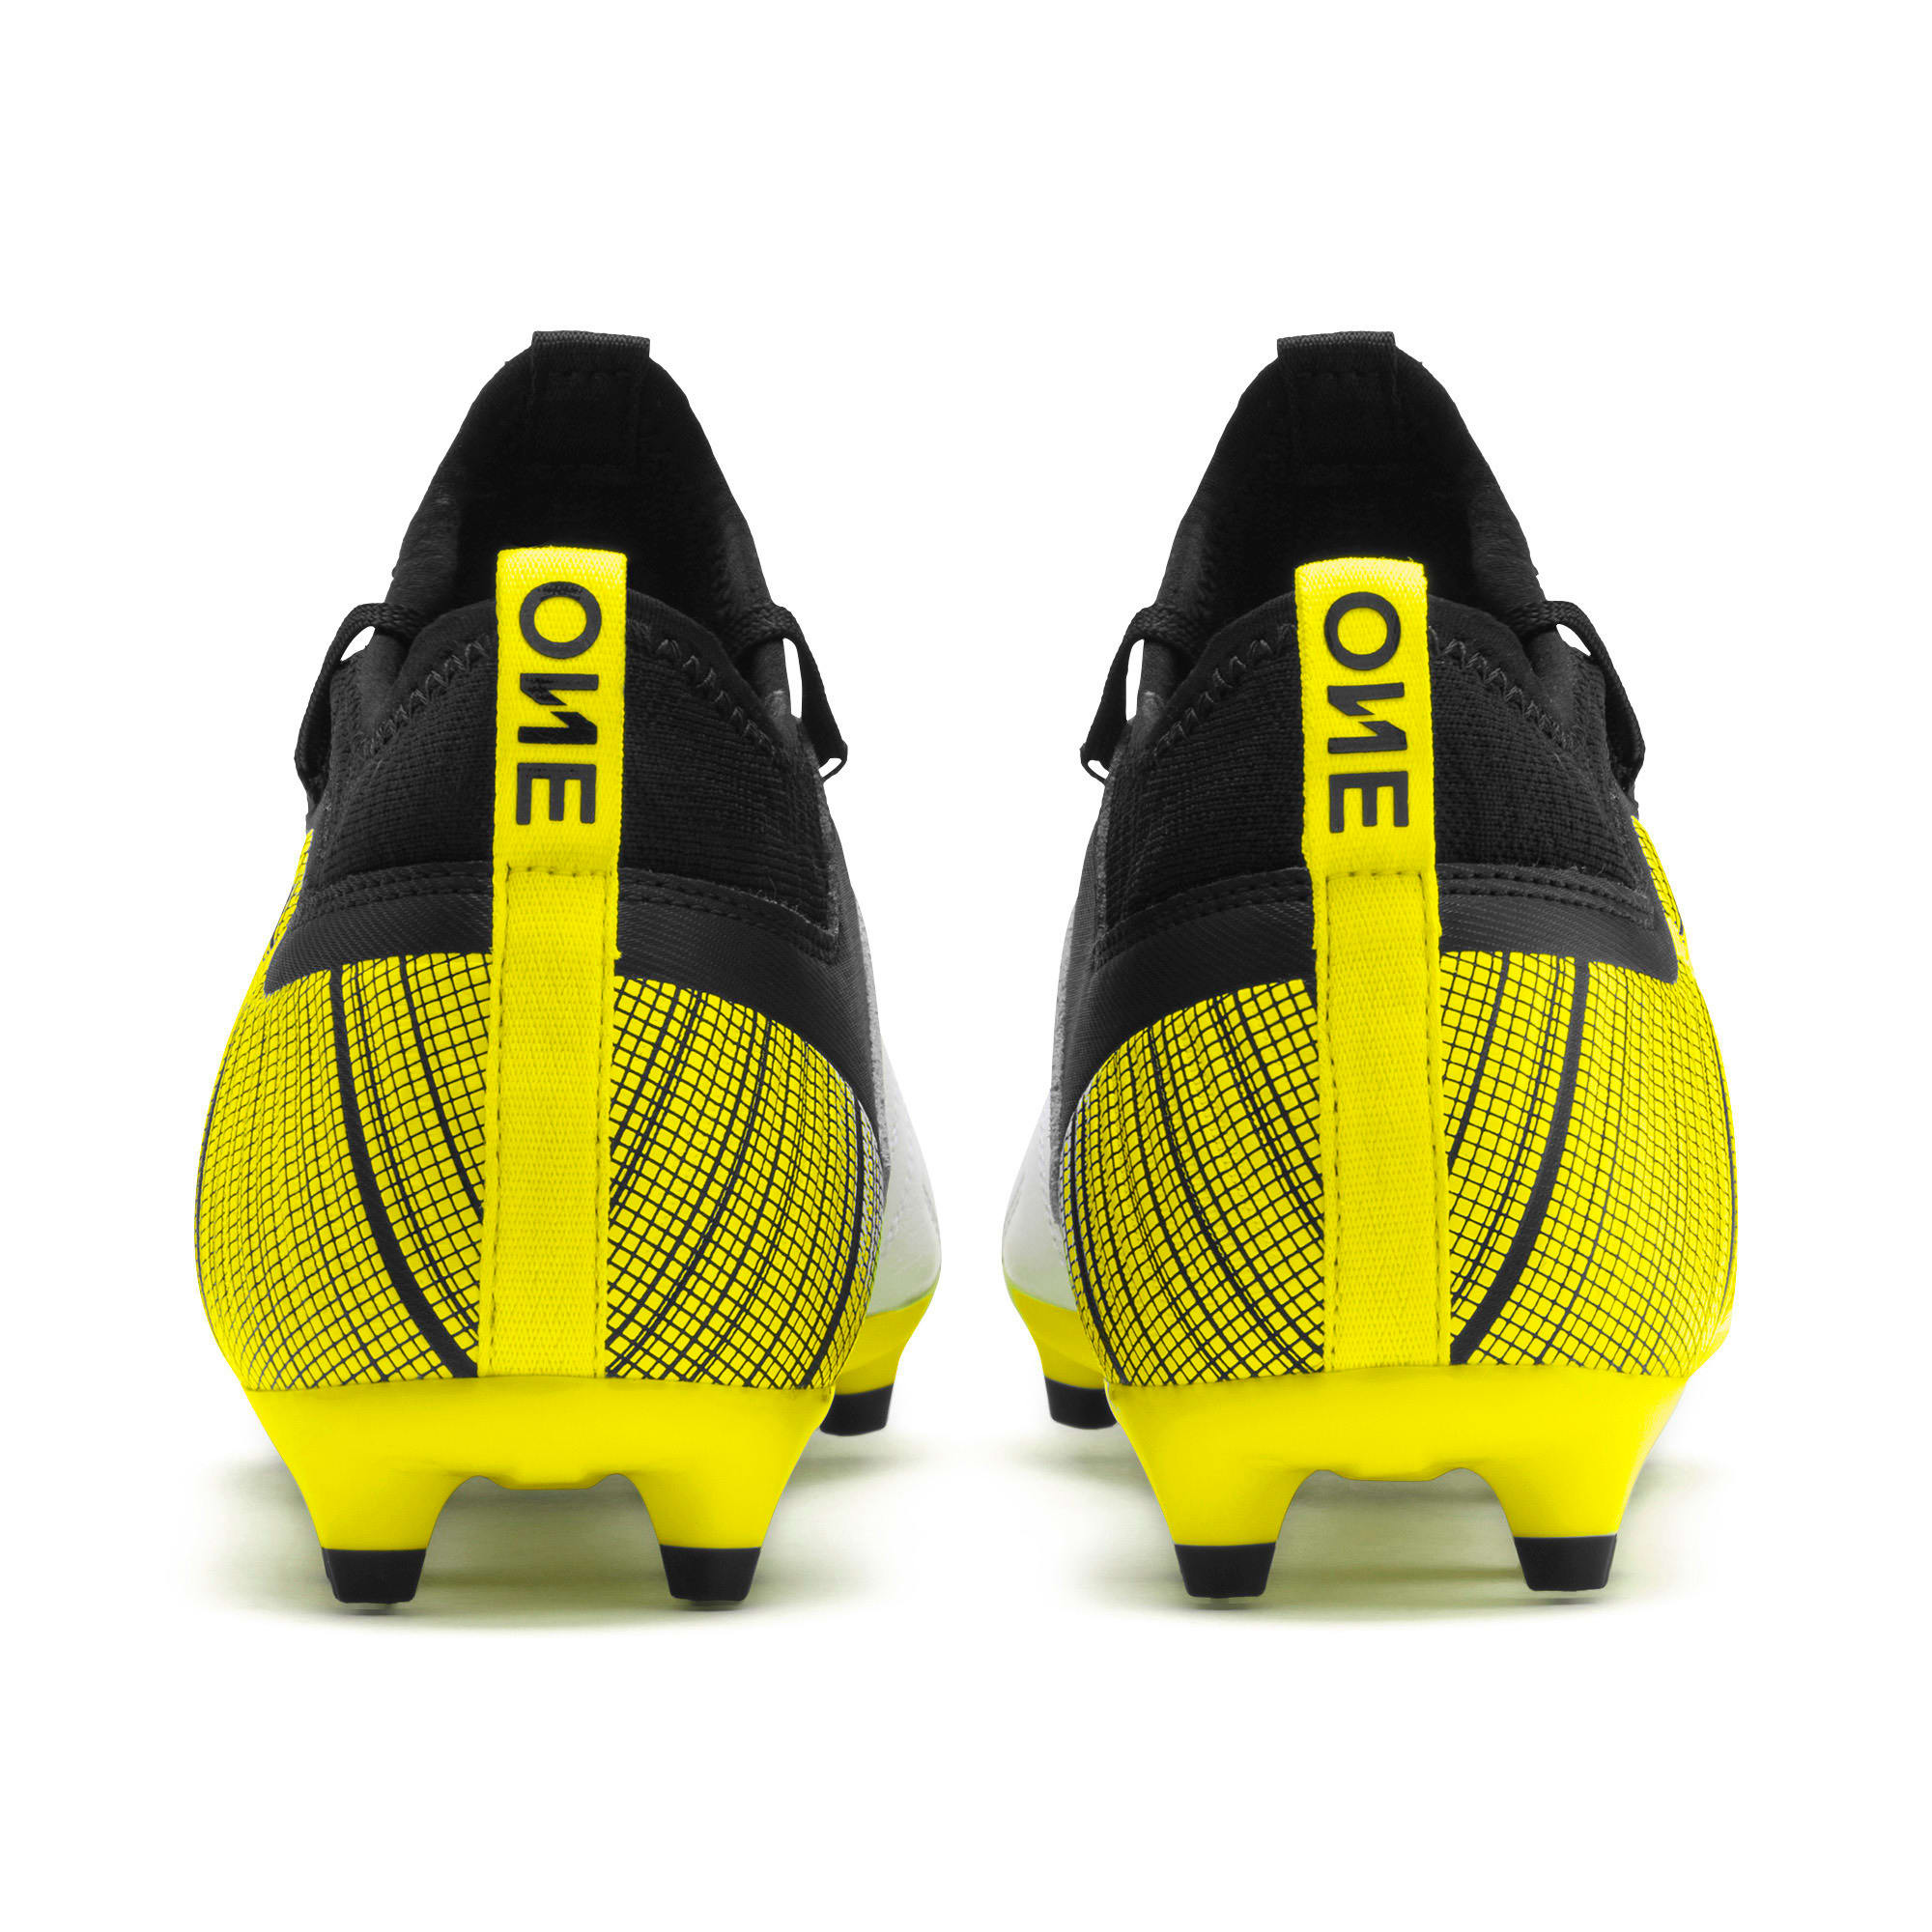 Thumbnail 4 of PUMA ONE 5.3 FG/AG Men's Football Boots, White-Black-Yellow Alert, medium